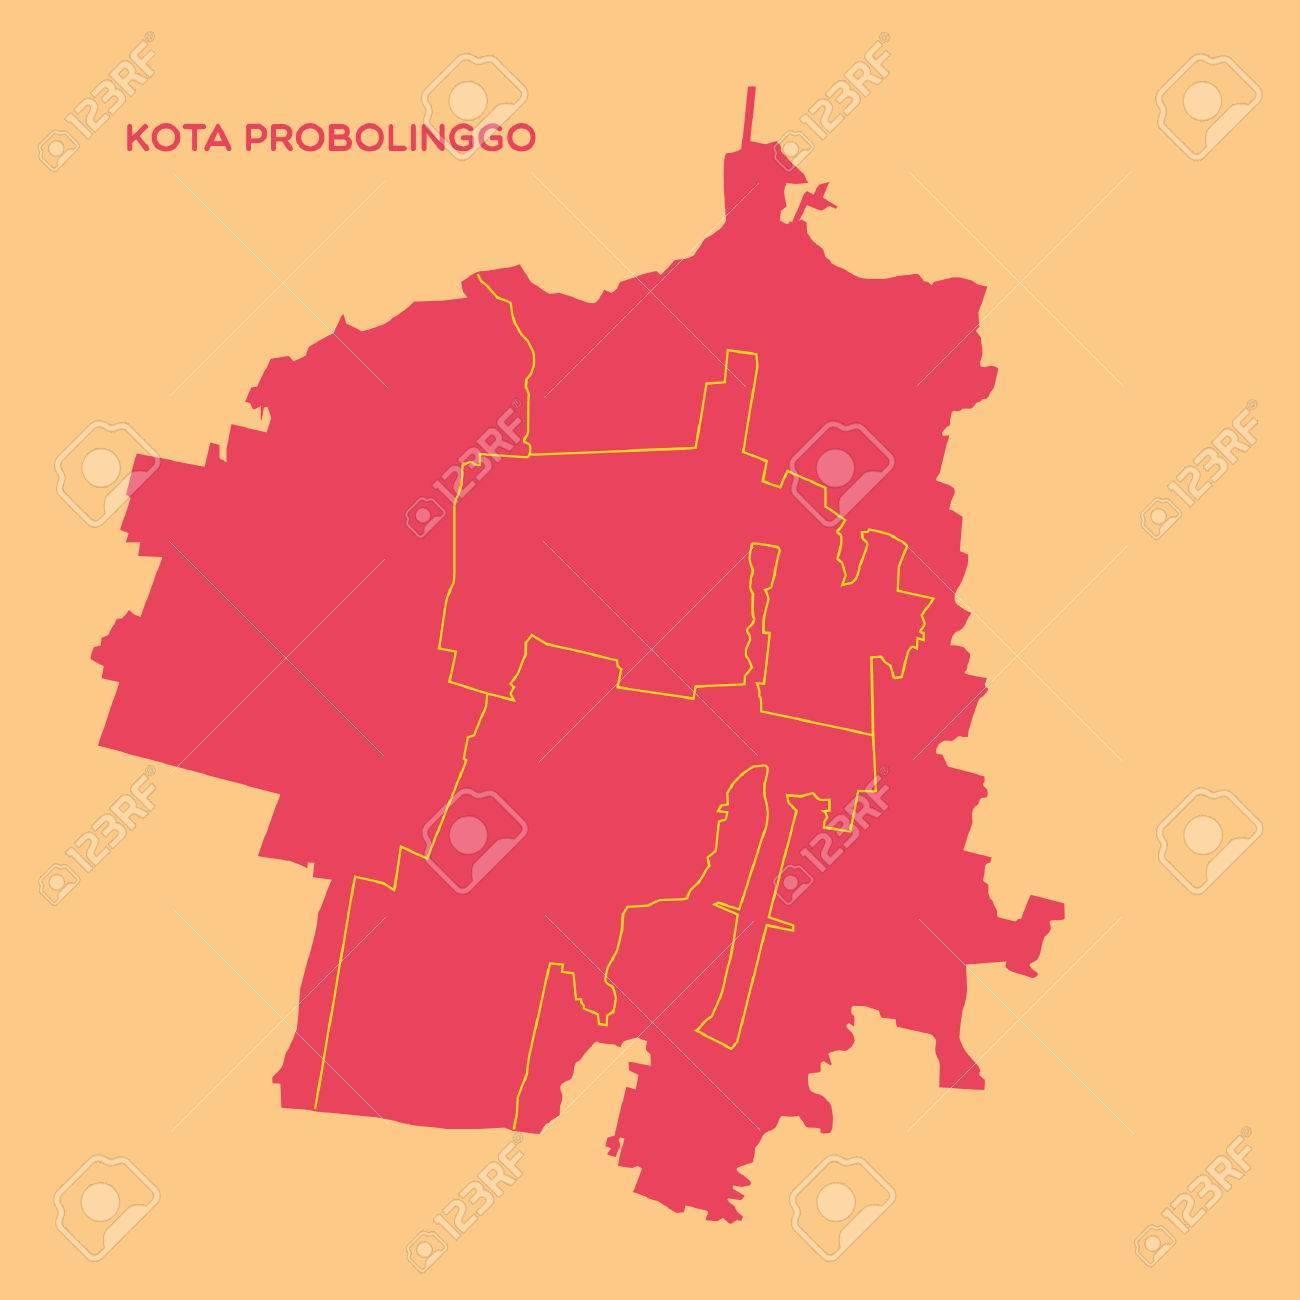 Map Of Kota Probolinggo Royalty Free Cliparts Vectors And Stock Illustration Image 52631687